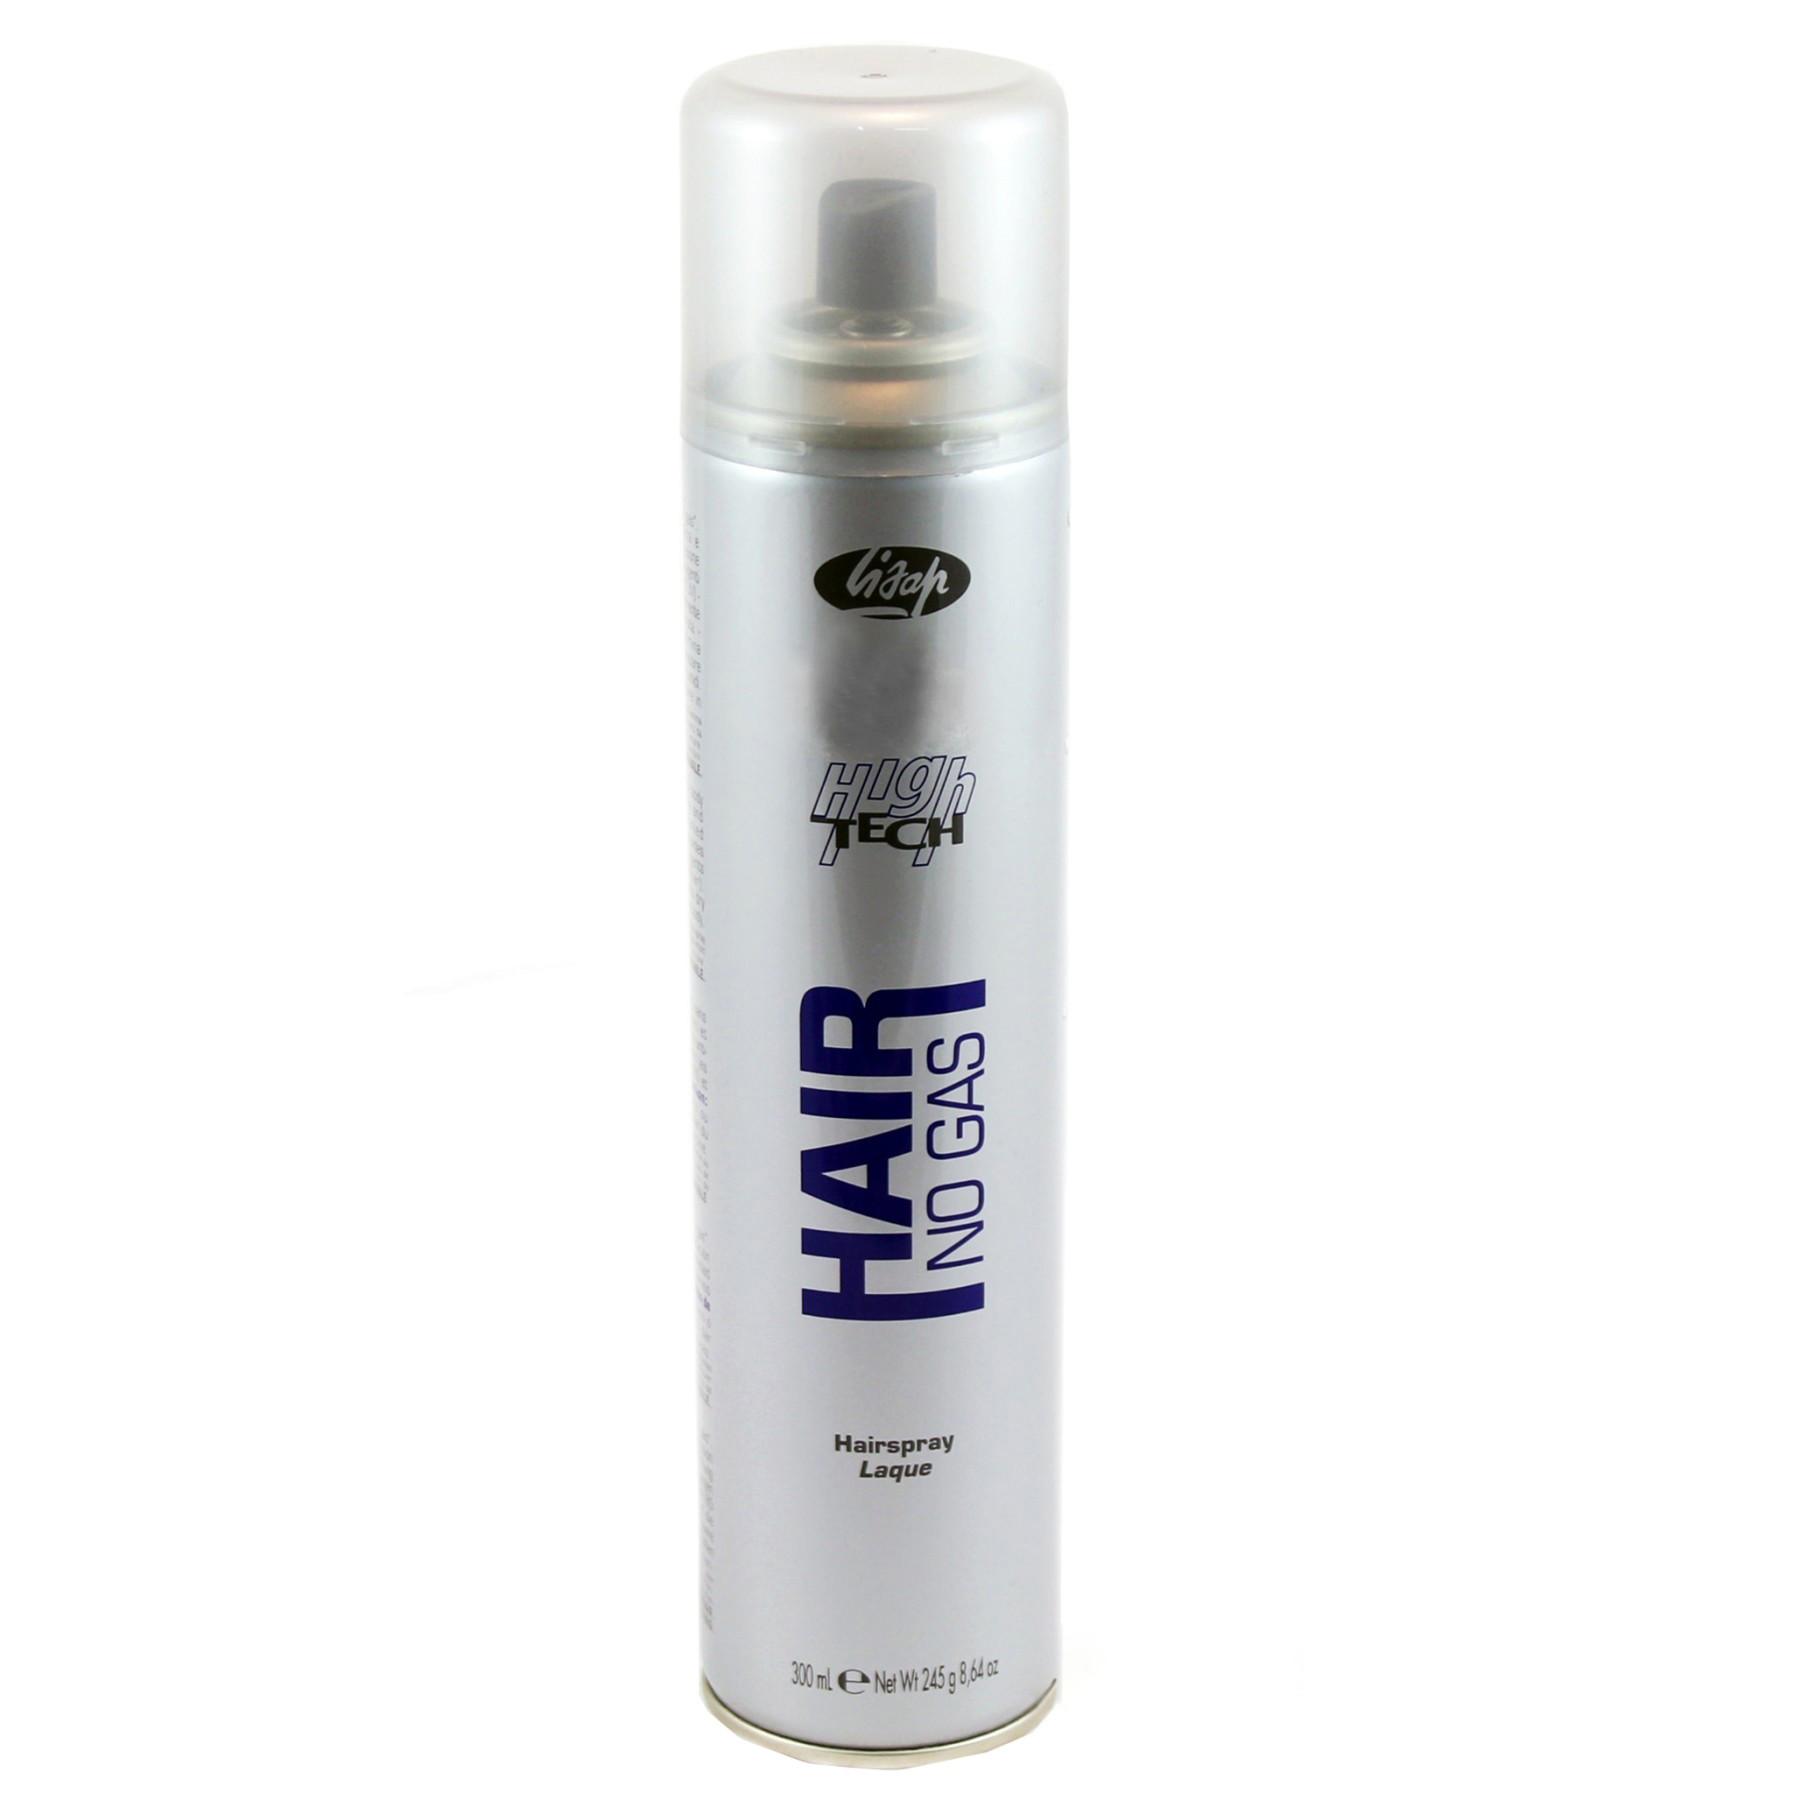 Лак нормальной фиксации без газа Lisap High Tech Hair No Gas Hairspray 300 мл